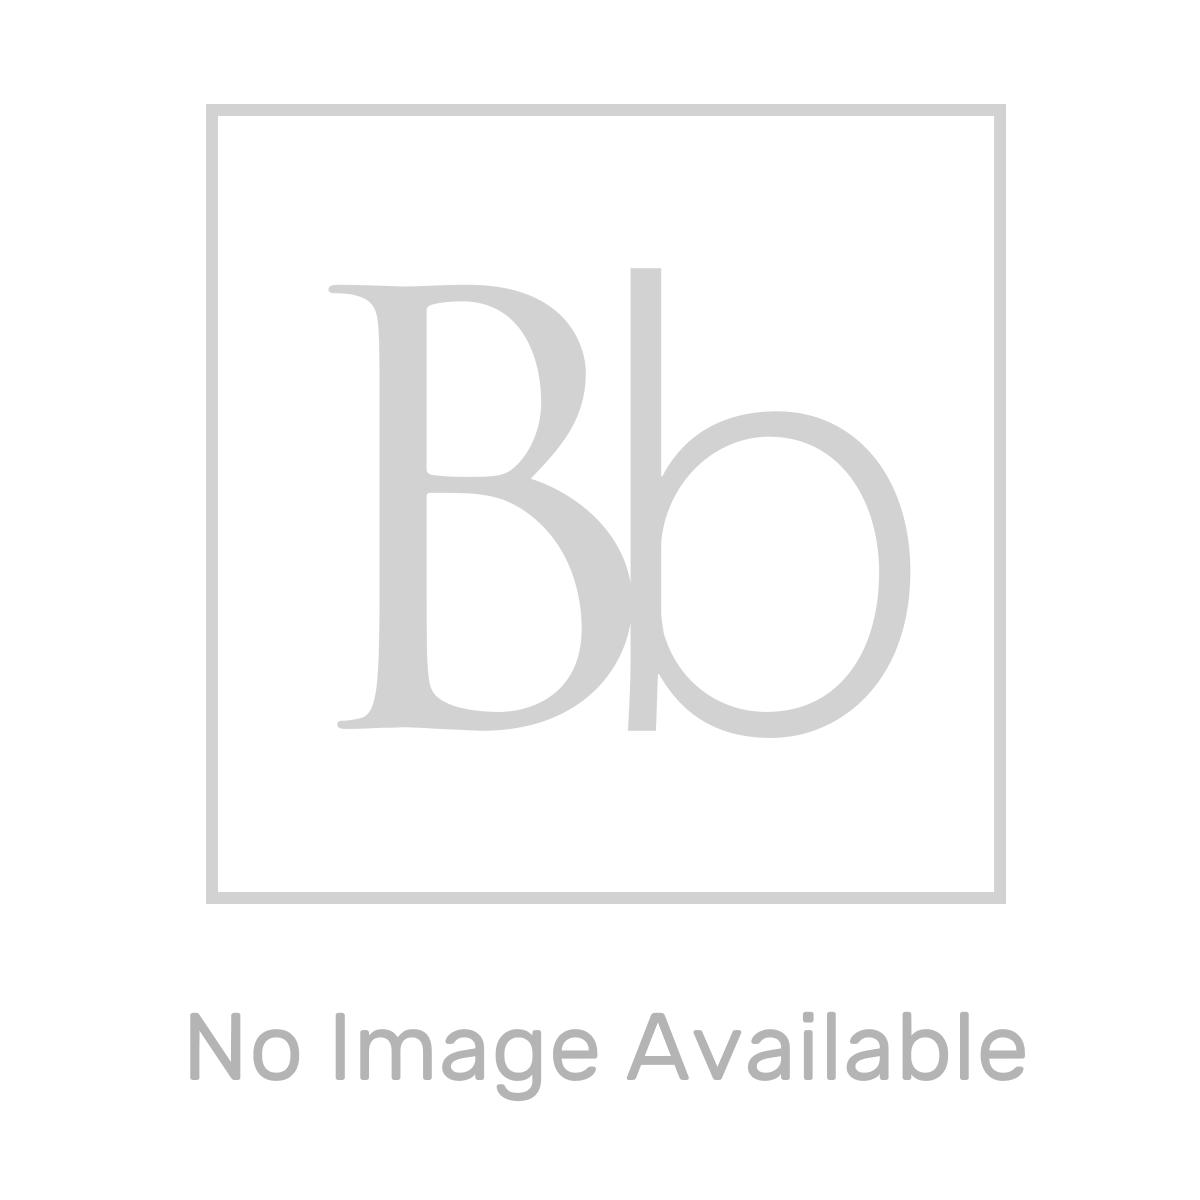 Aquadart Venturi 6 Bi-Fold Shower Door with Optional Side Panel